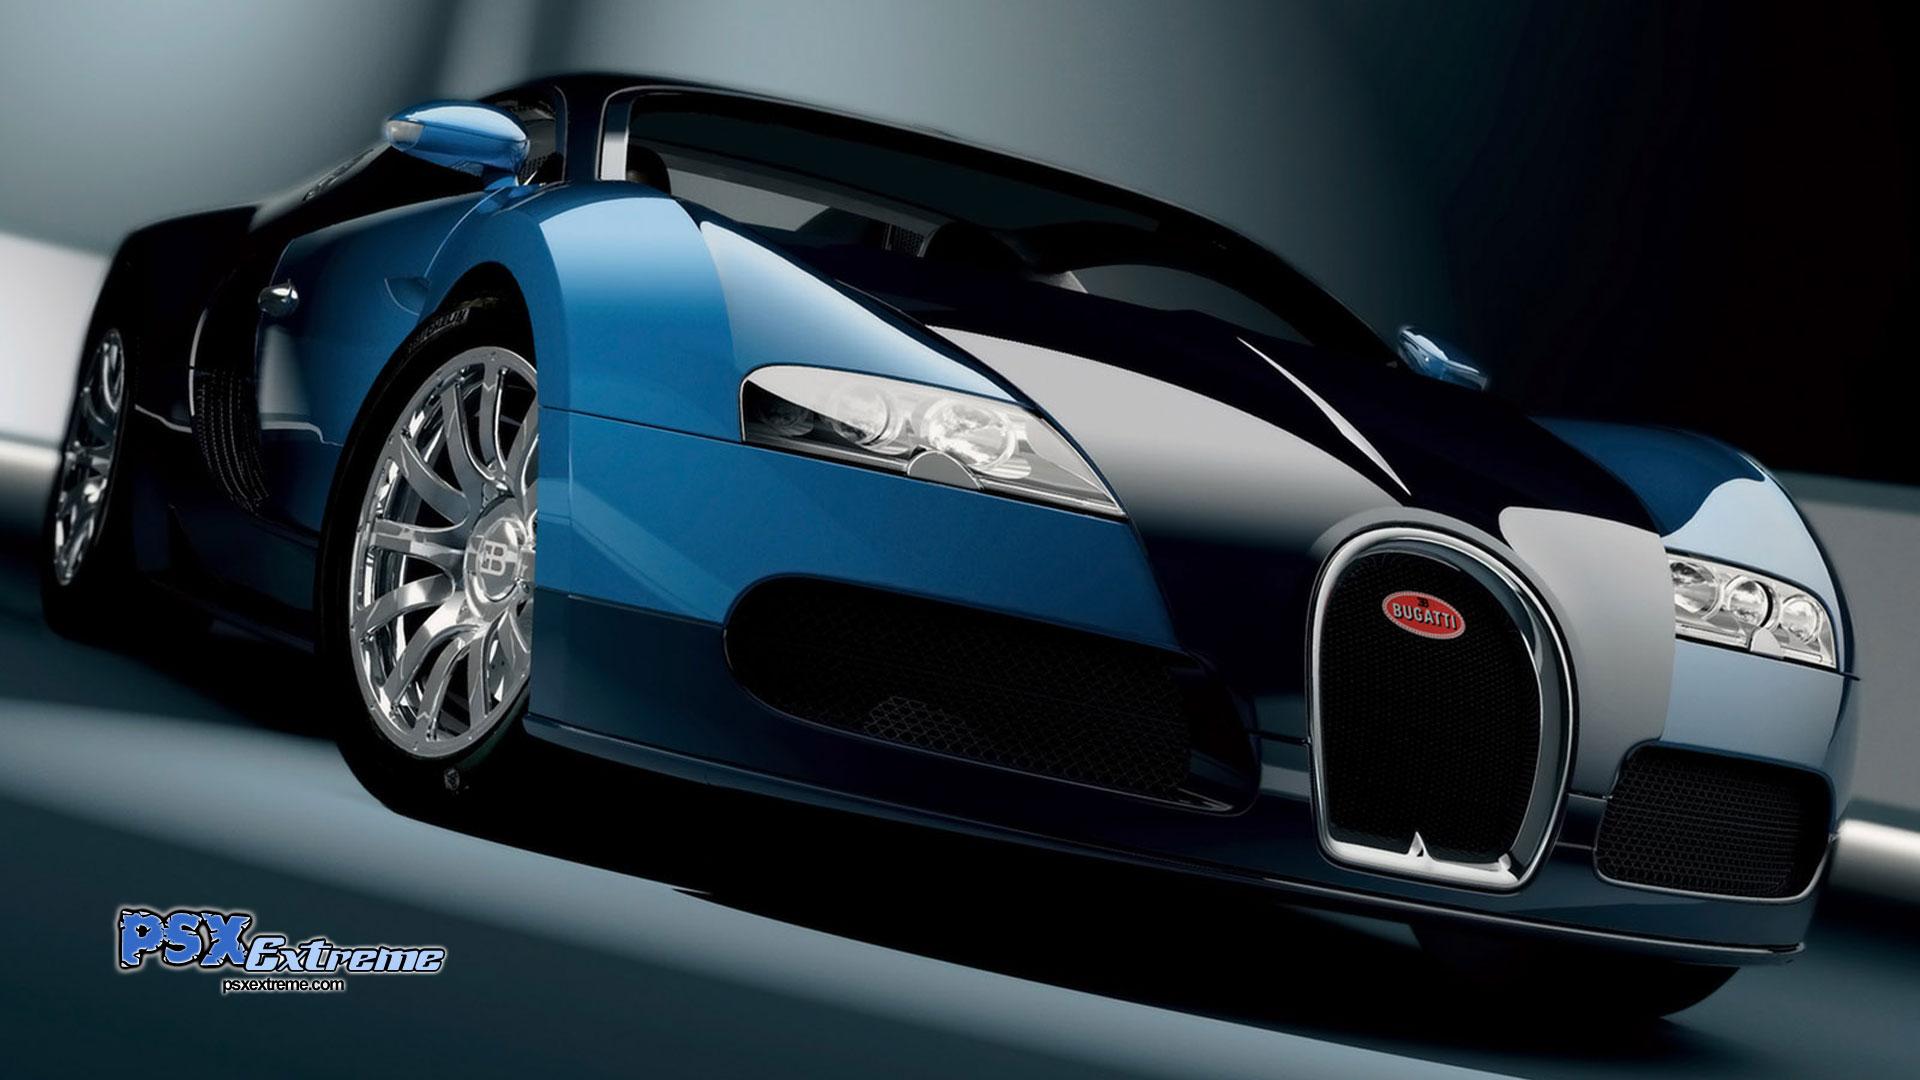 Awesome Bugatti Veyron Wallpaper